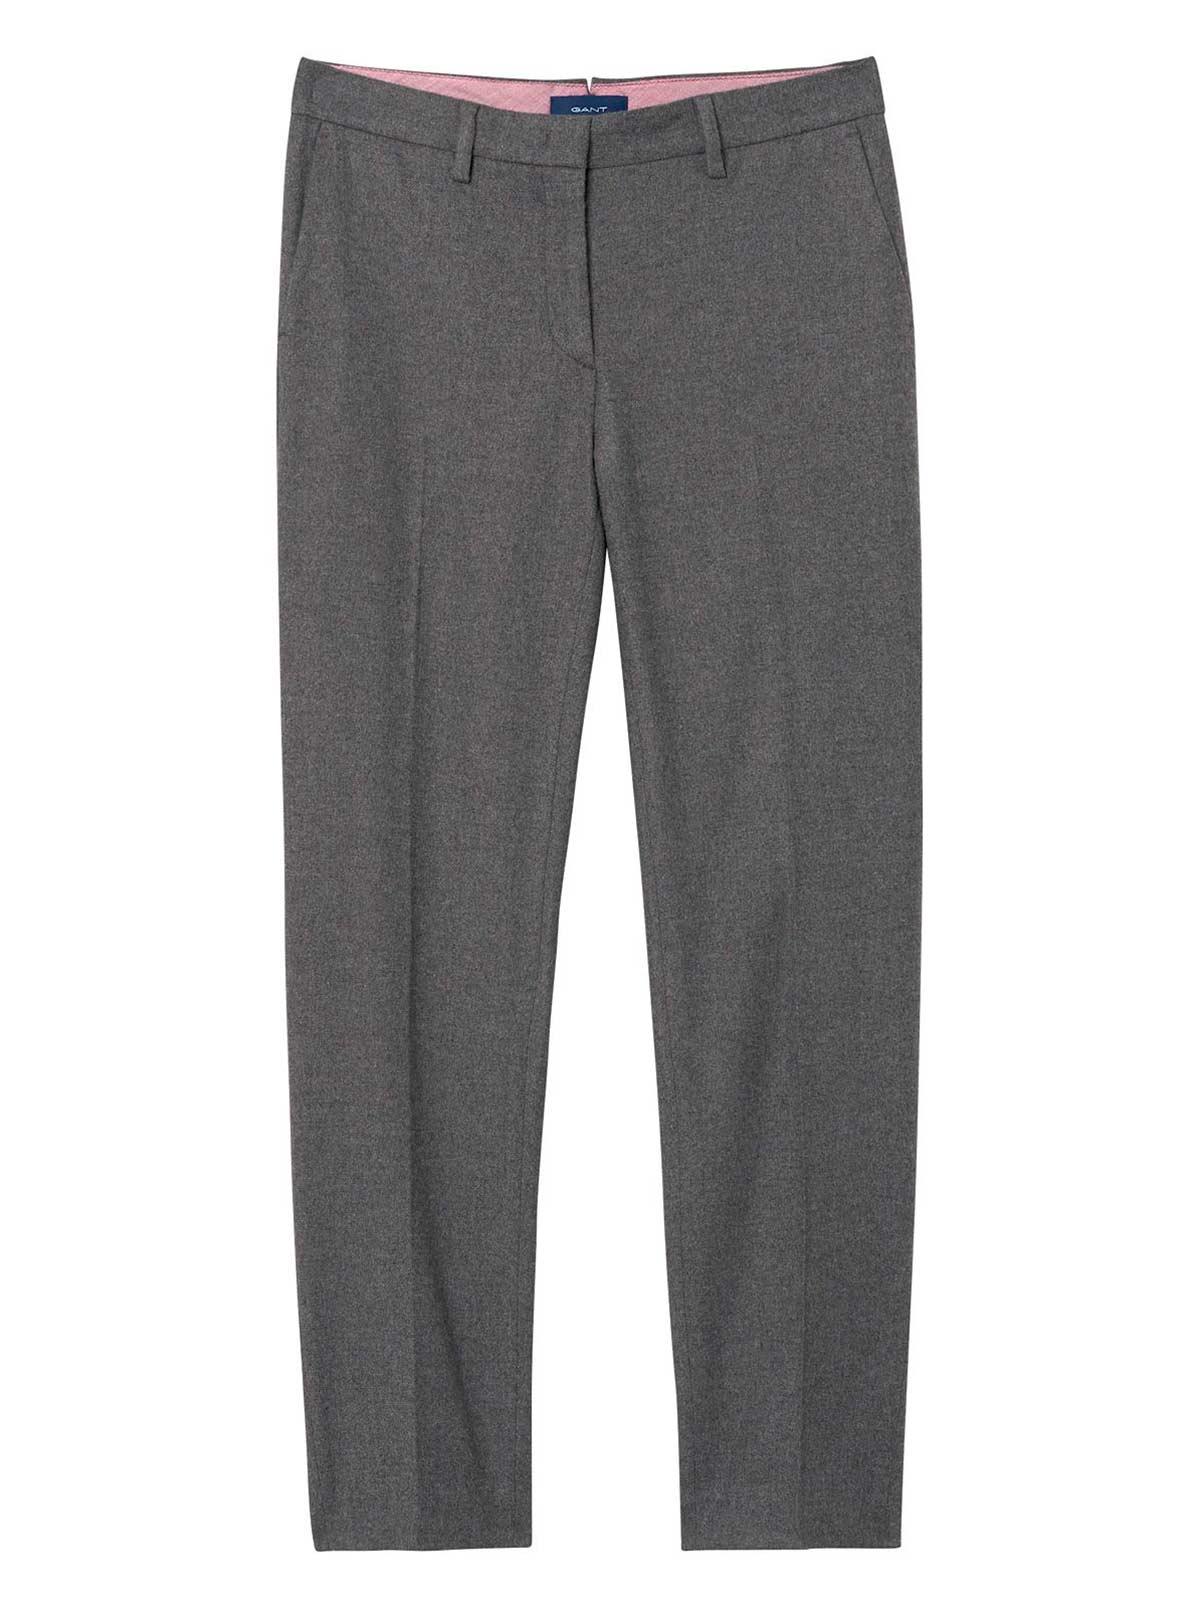 Picture of GANT   Women's Flannel Pants